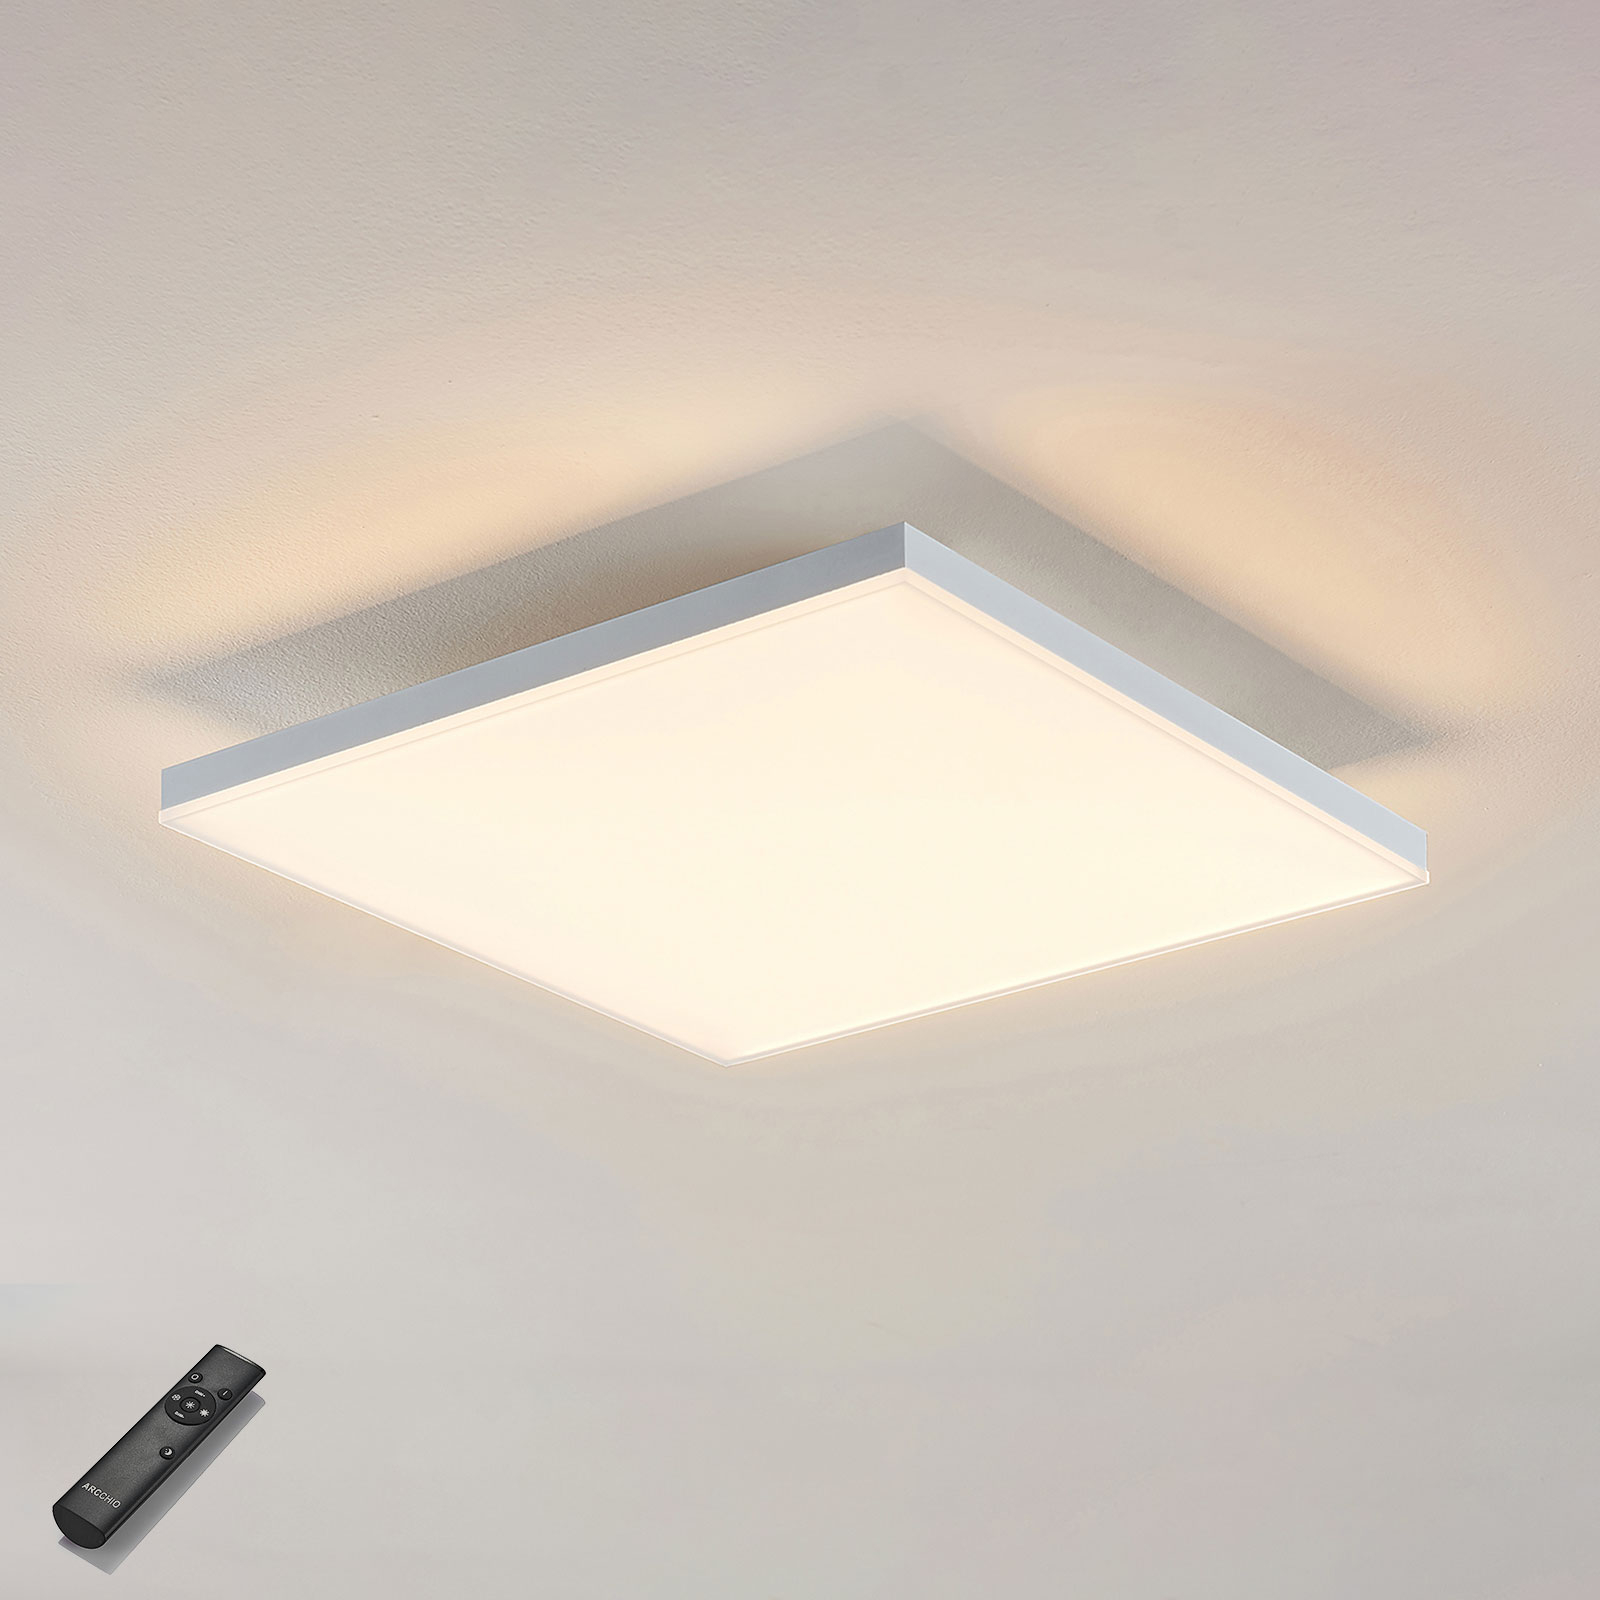 LED-Panel Blaan CCT Fernbedienung 39,5 x 39,5cm